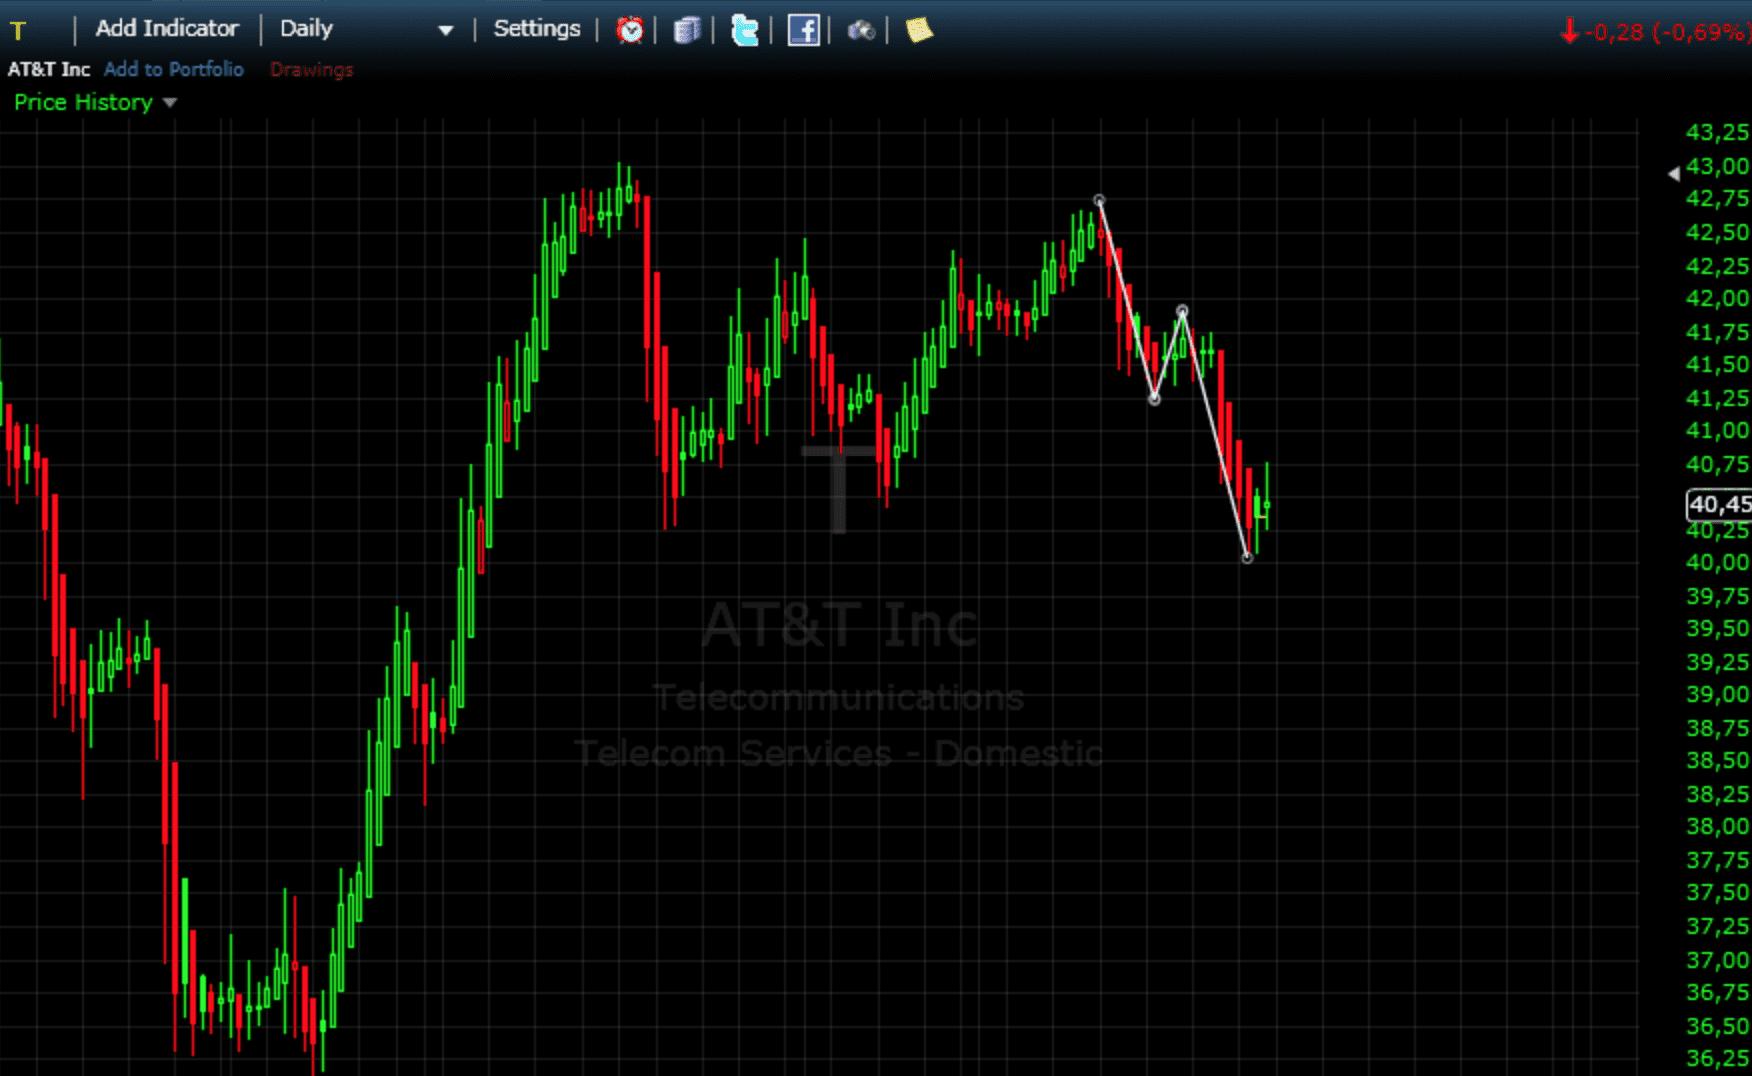 Edge-Trading: Die Aktienanalyse